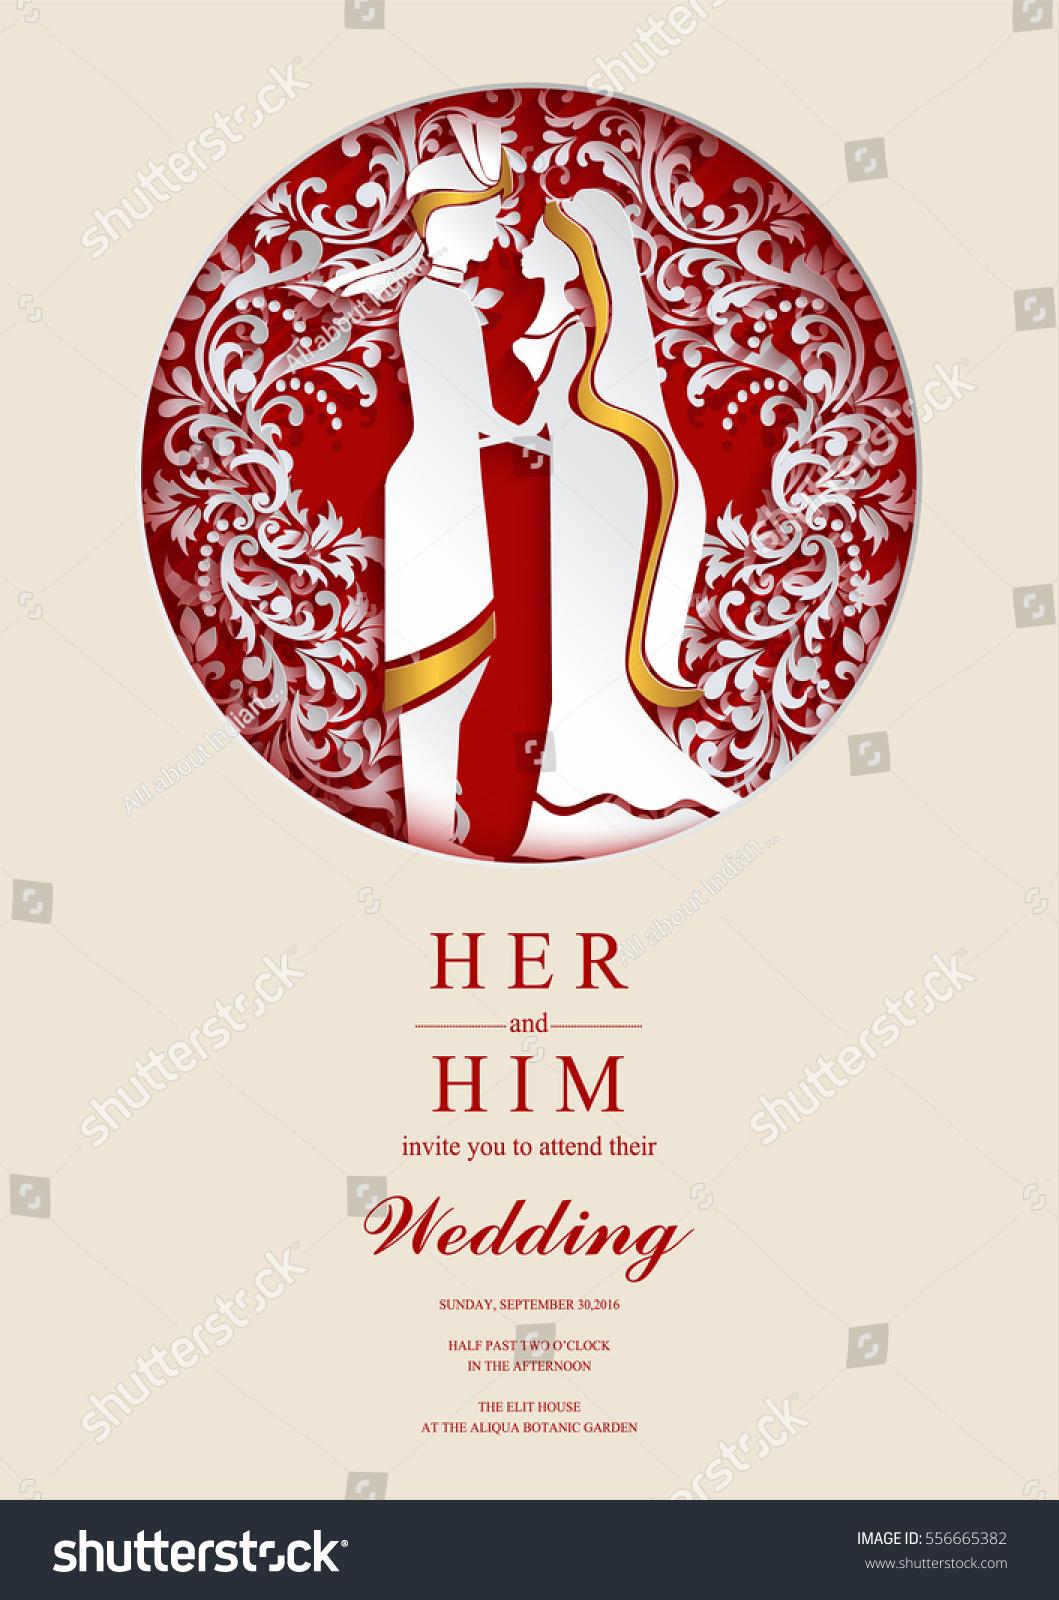 Beautiful Wedding Invitations Design Templates Images - Invitations ...